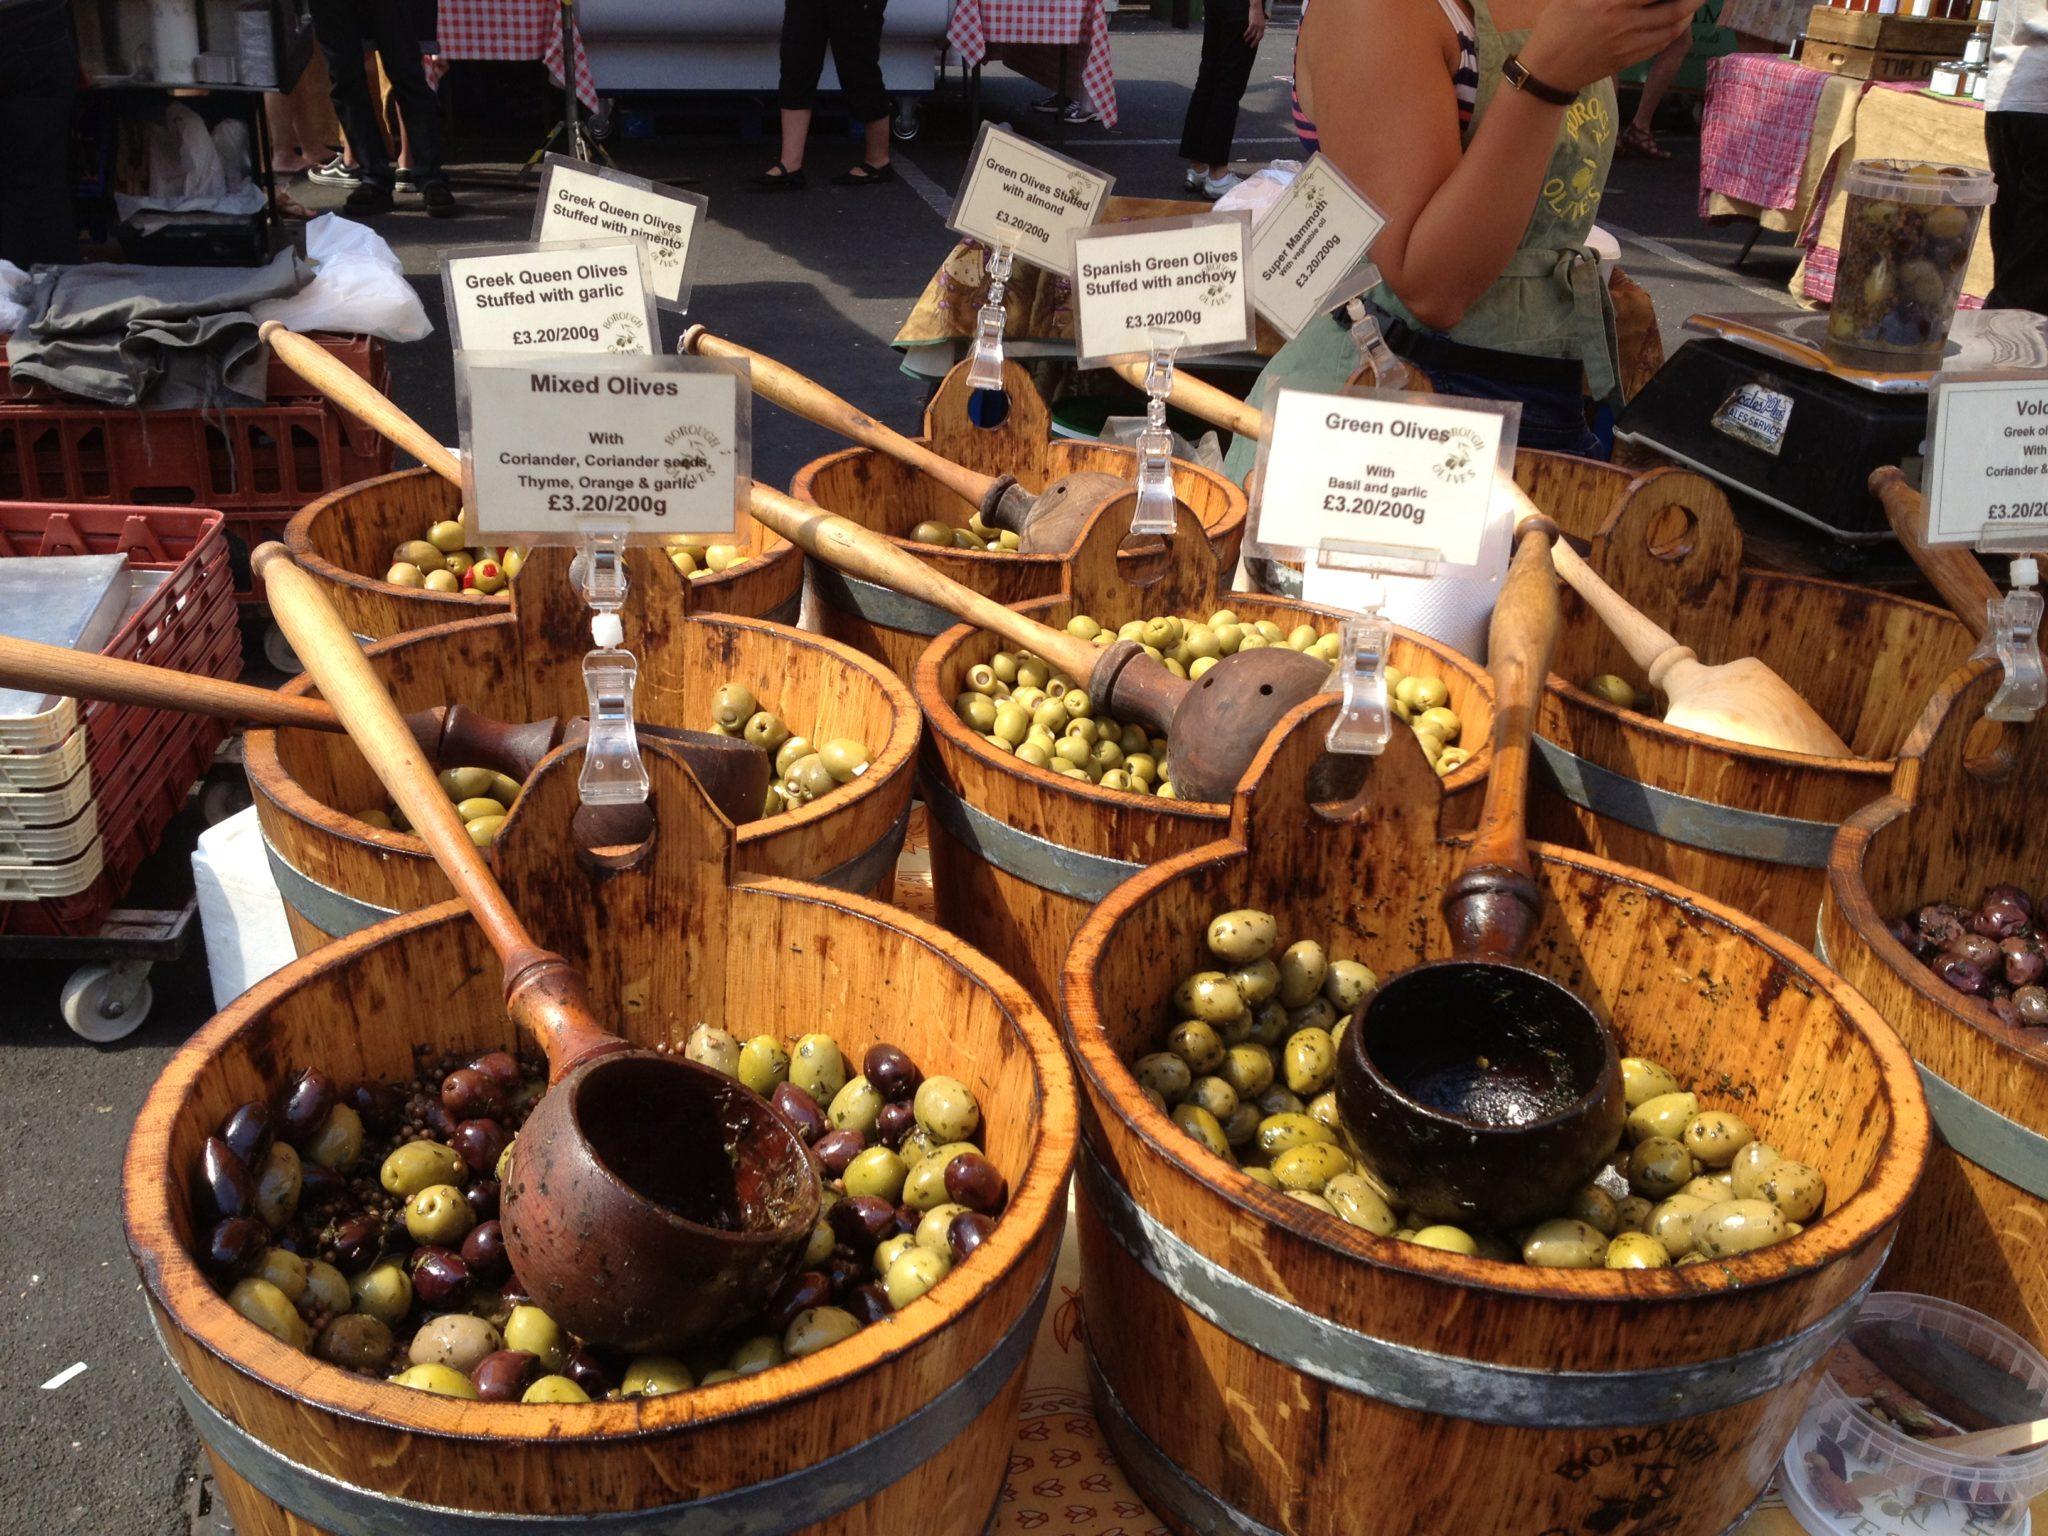 Oakhurst Olives Variation